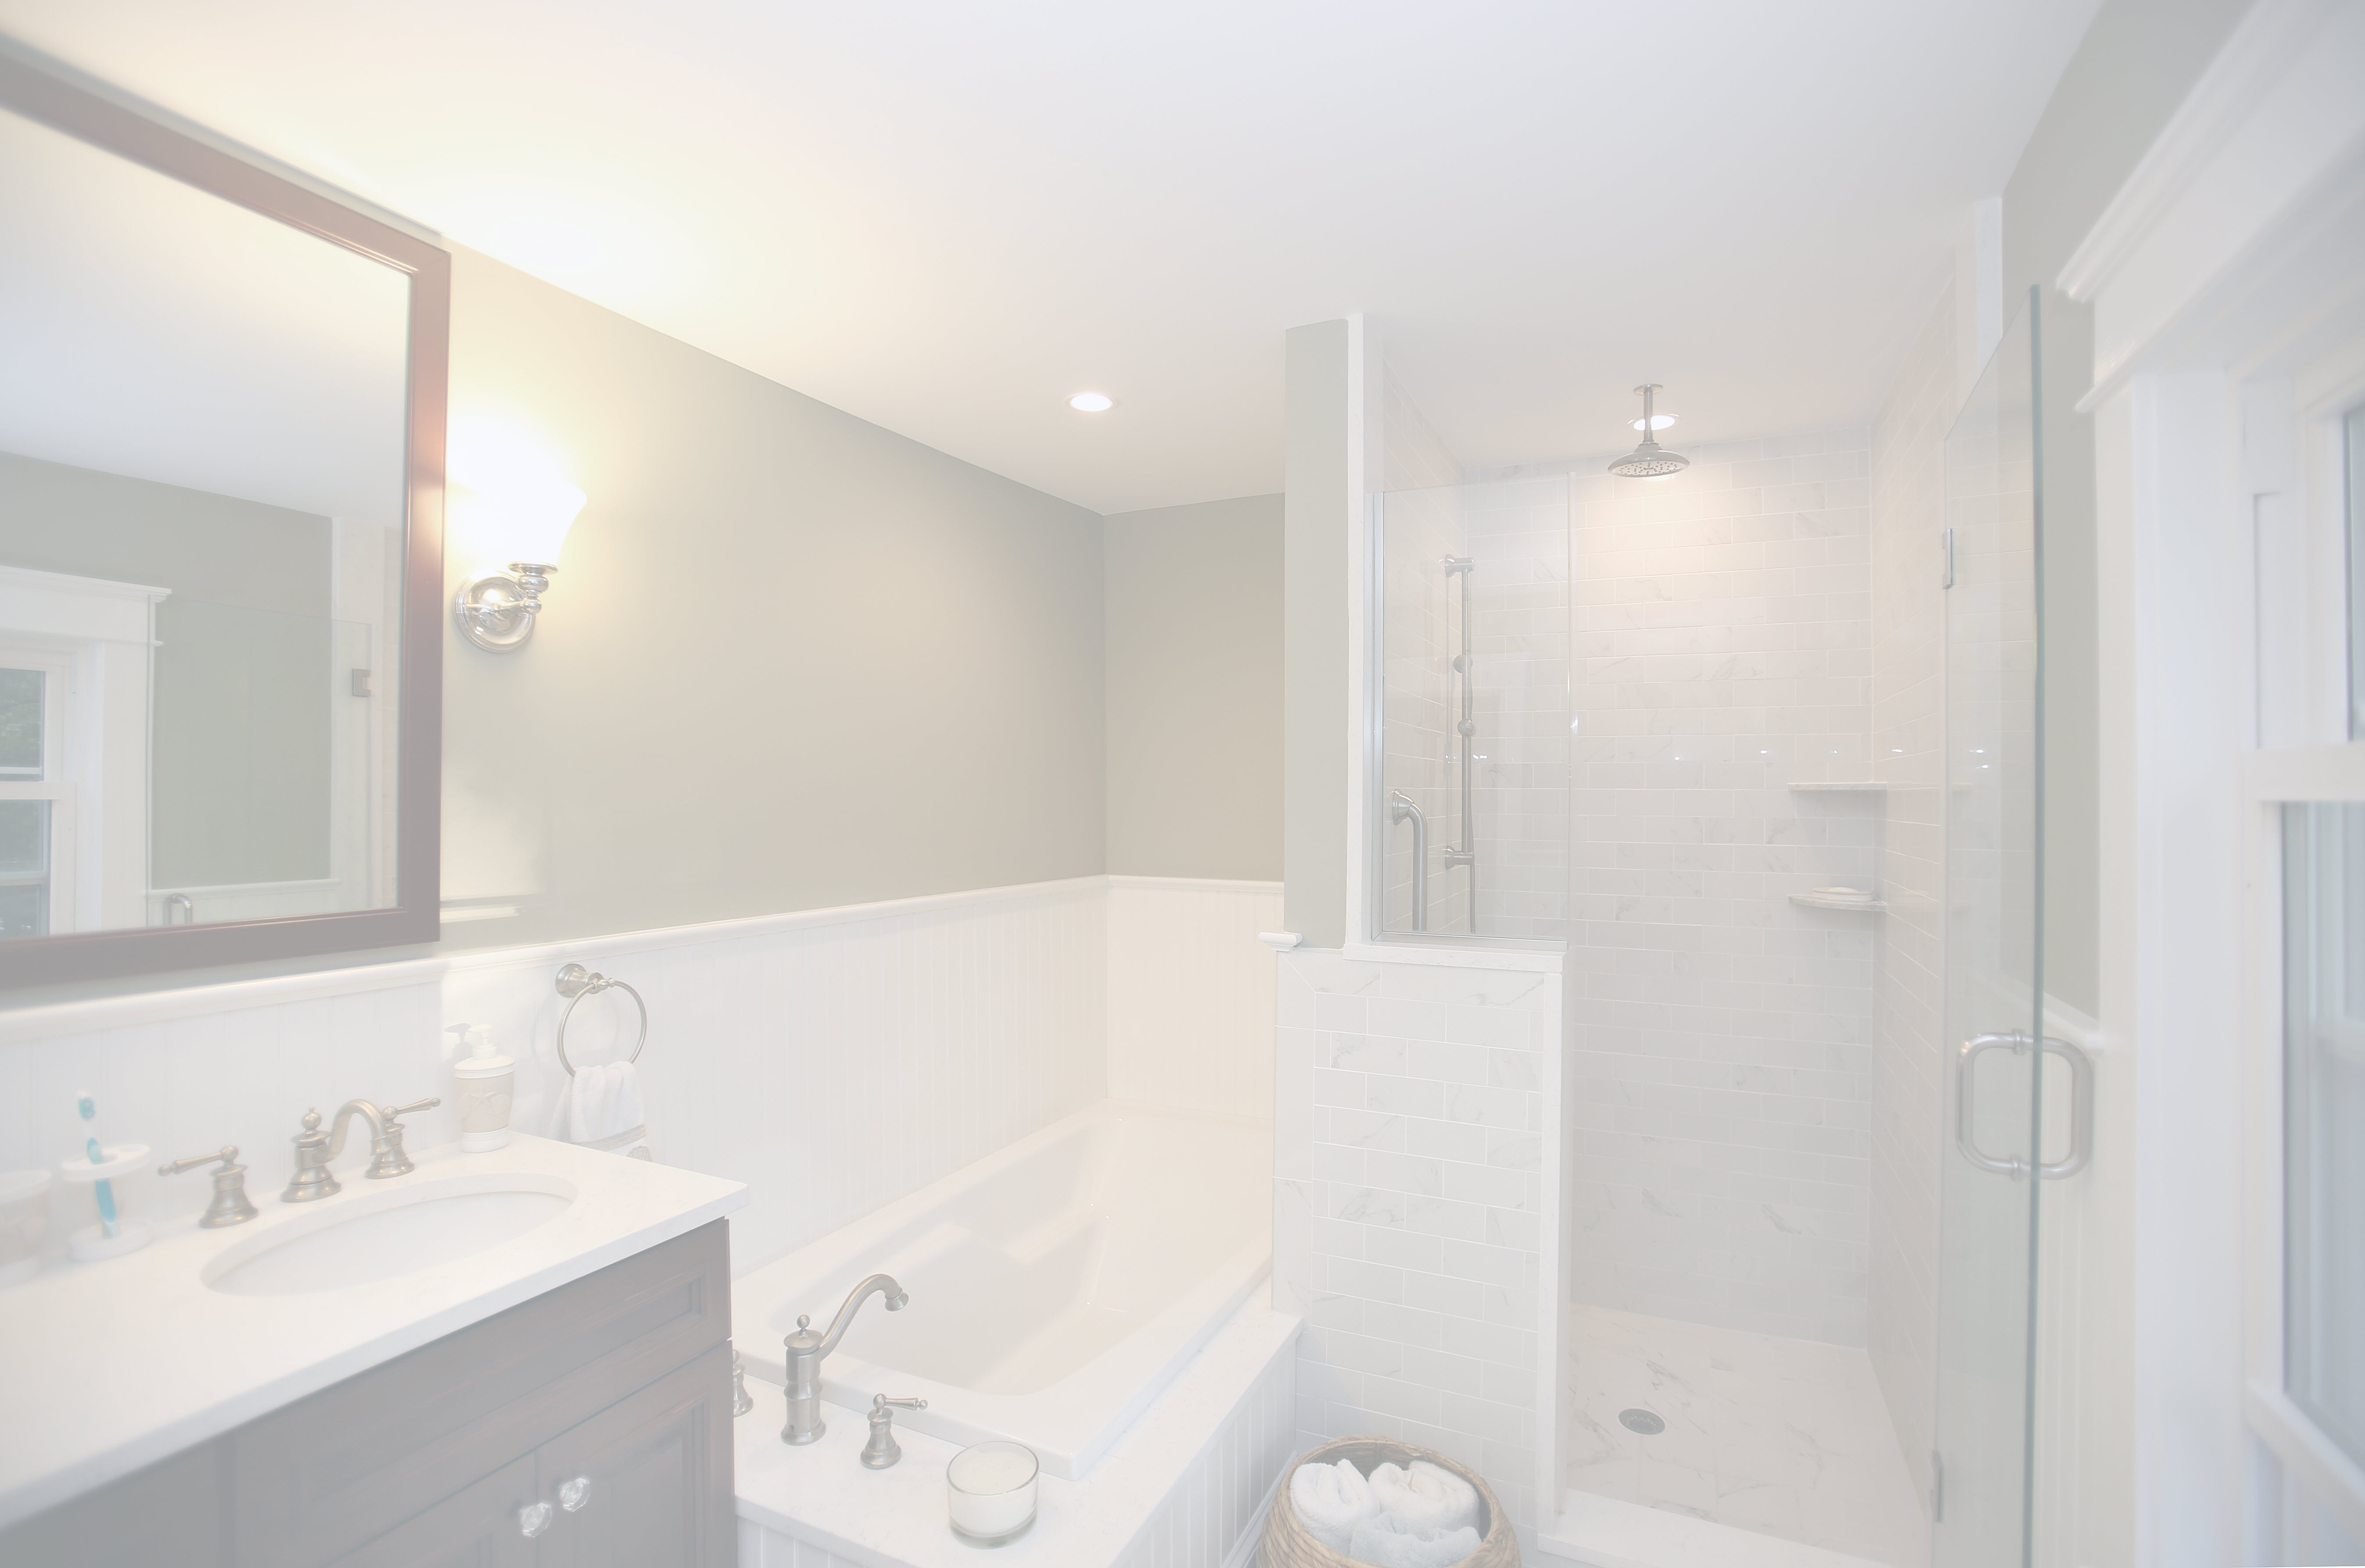 Bathroom Remodel San Jose Bathroom Remodel San Jose Bath Ideas Tags - Bathroom remodel san jose